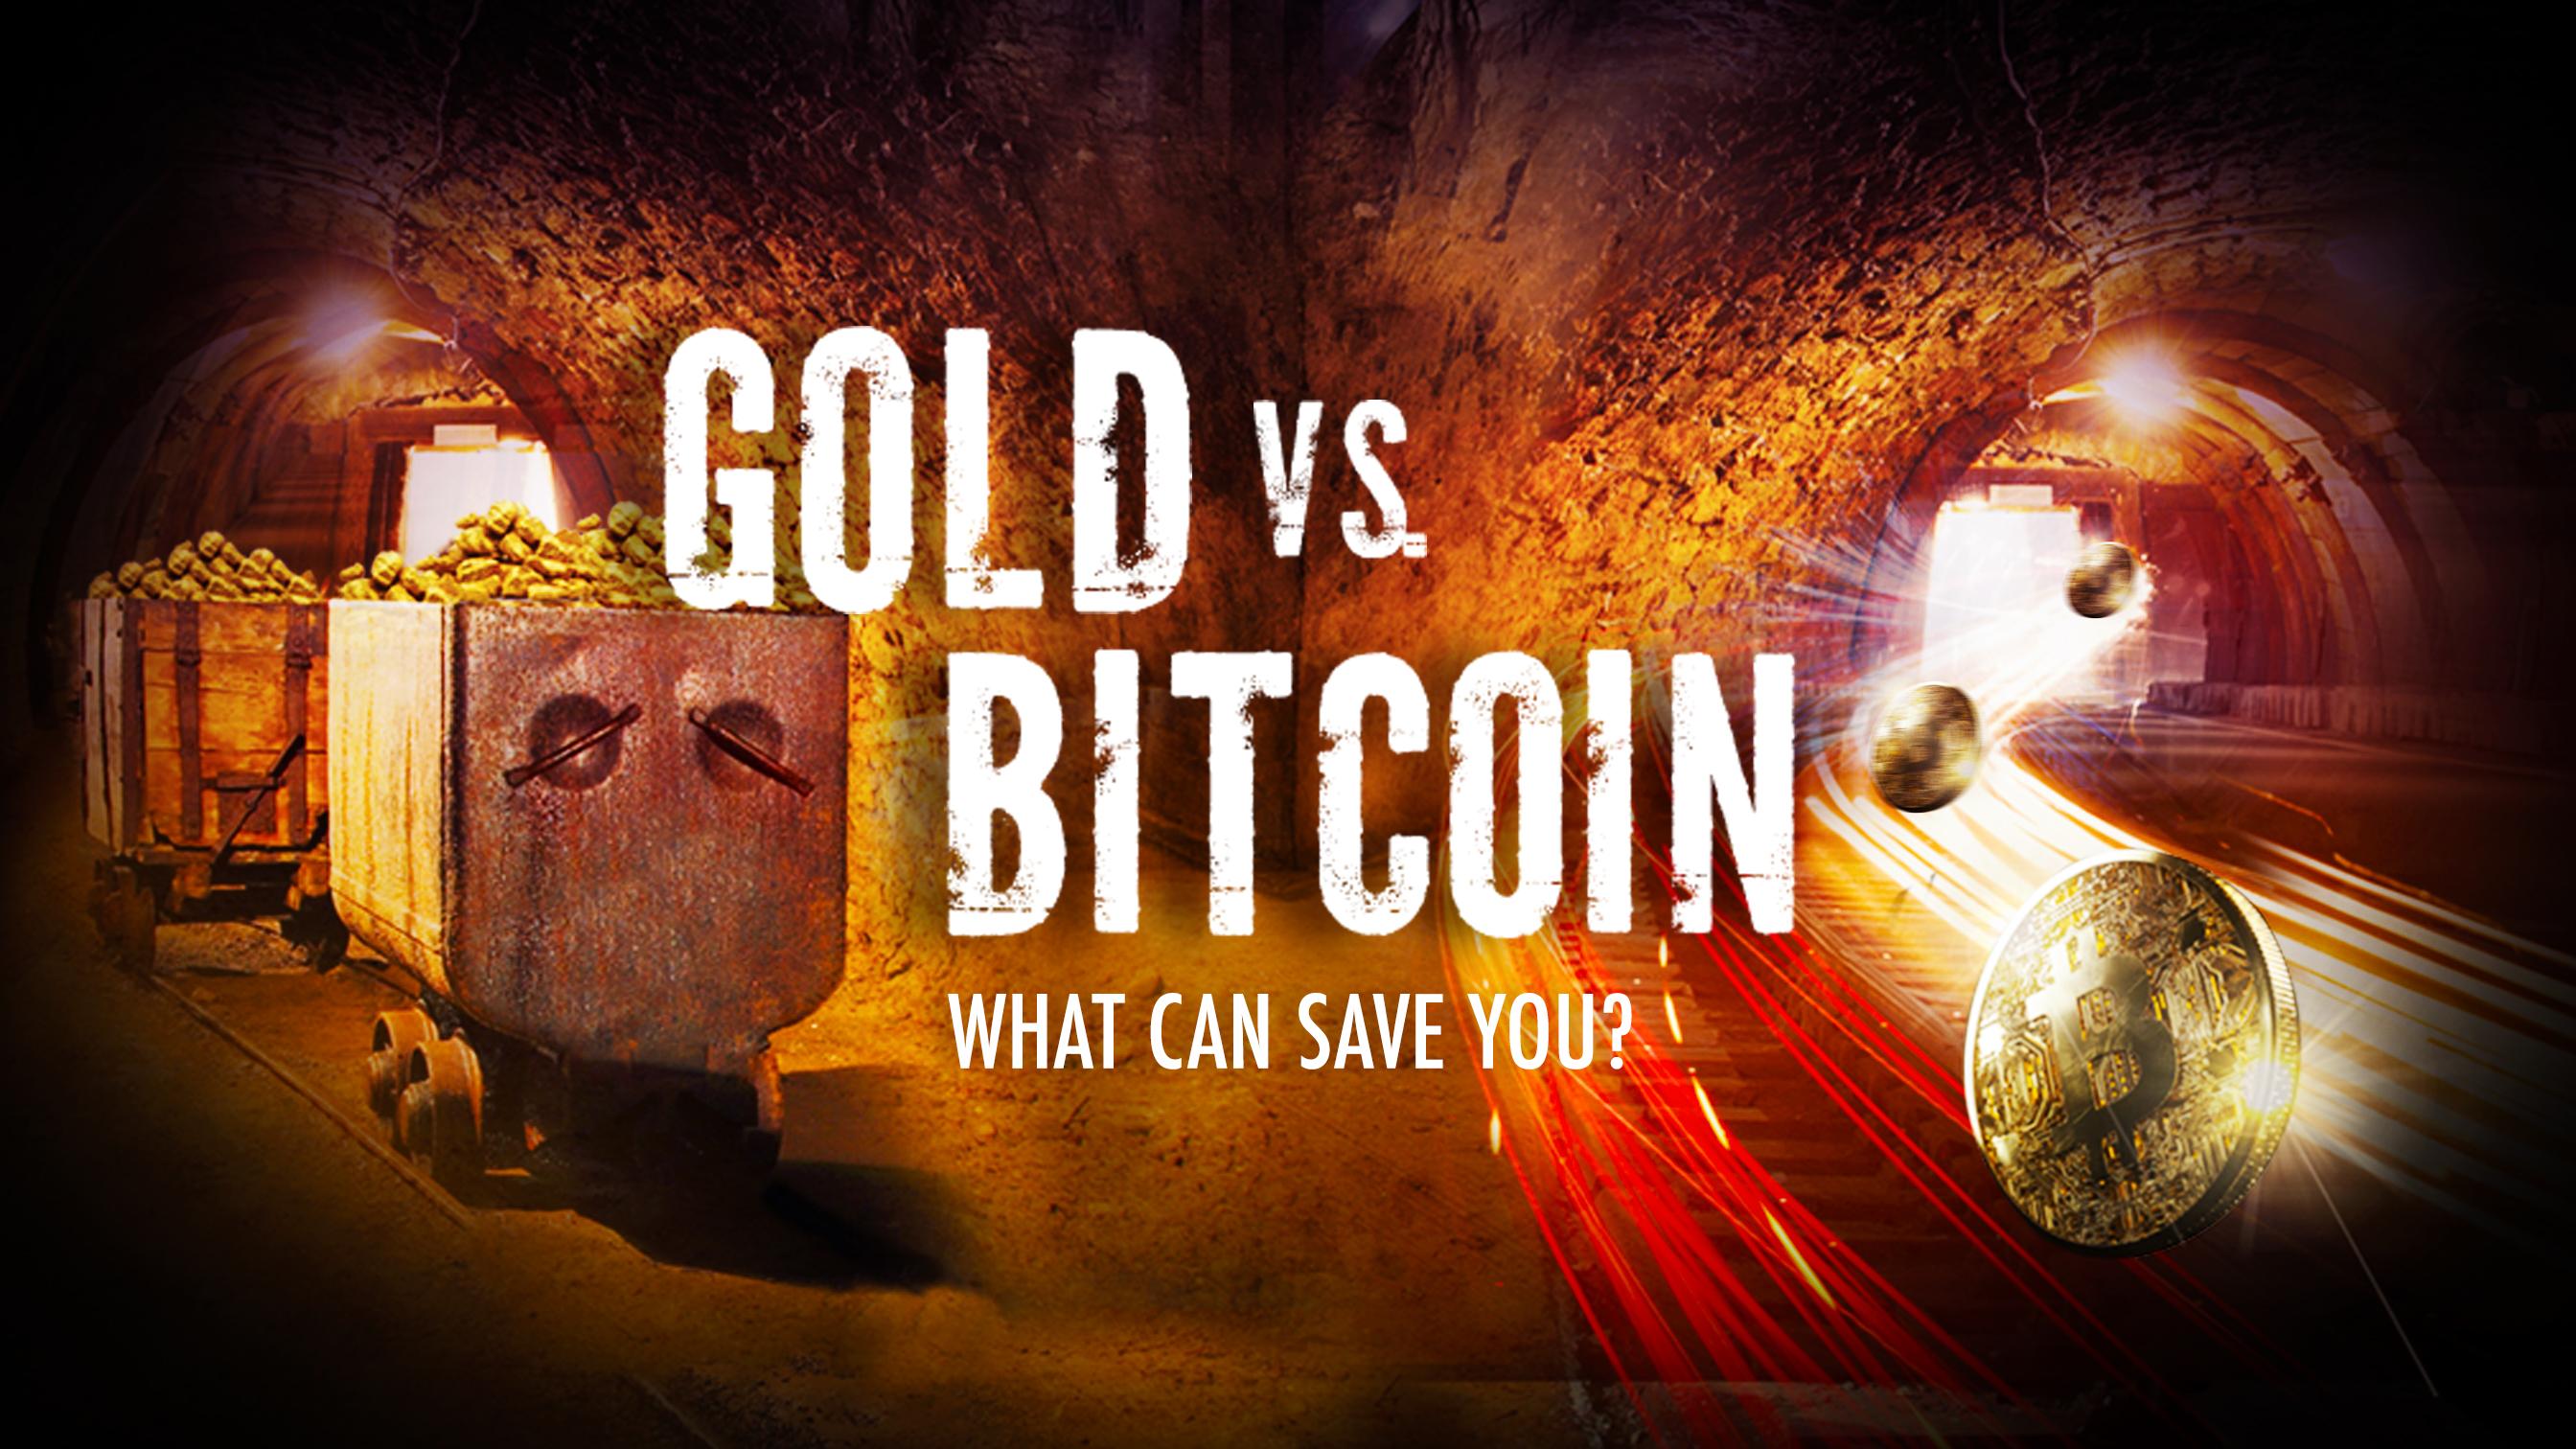 Gold vs Bitcoin on Real Vision